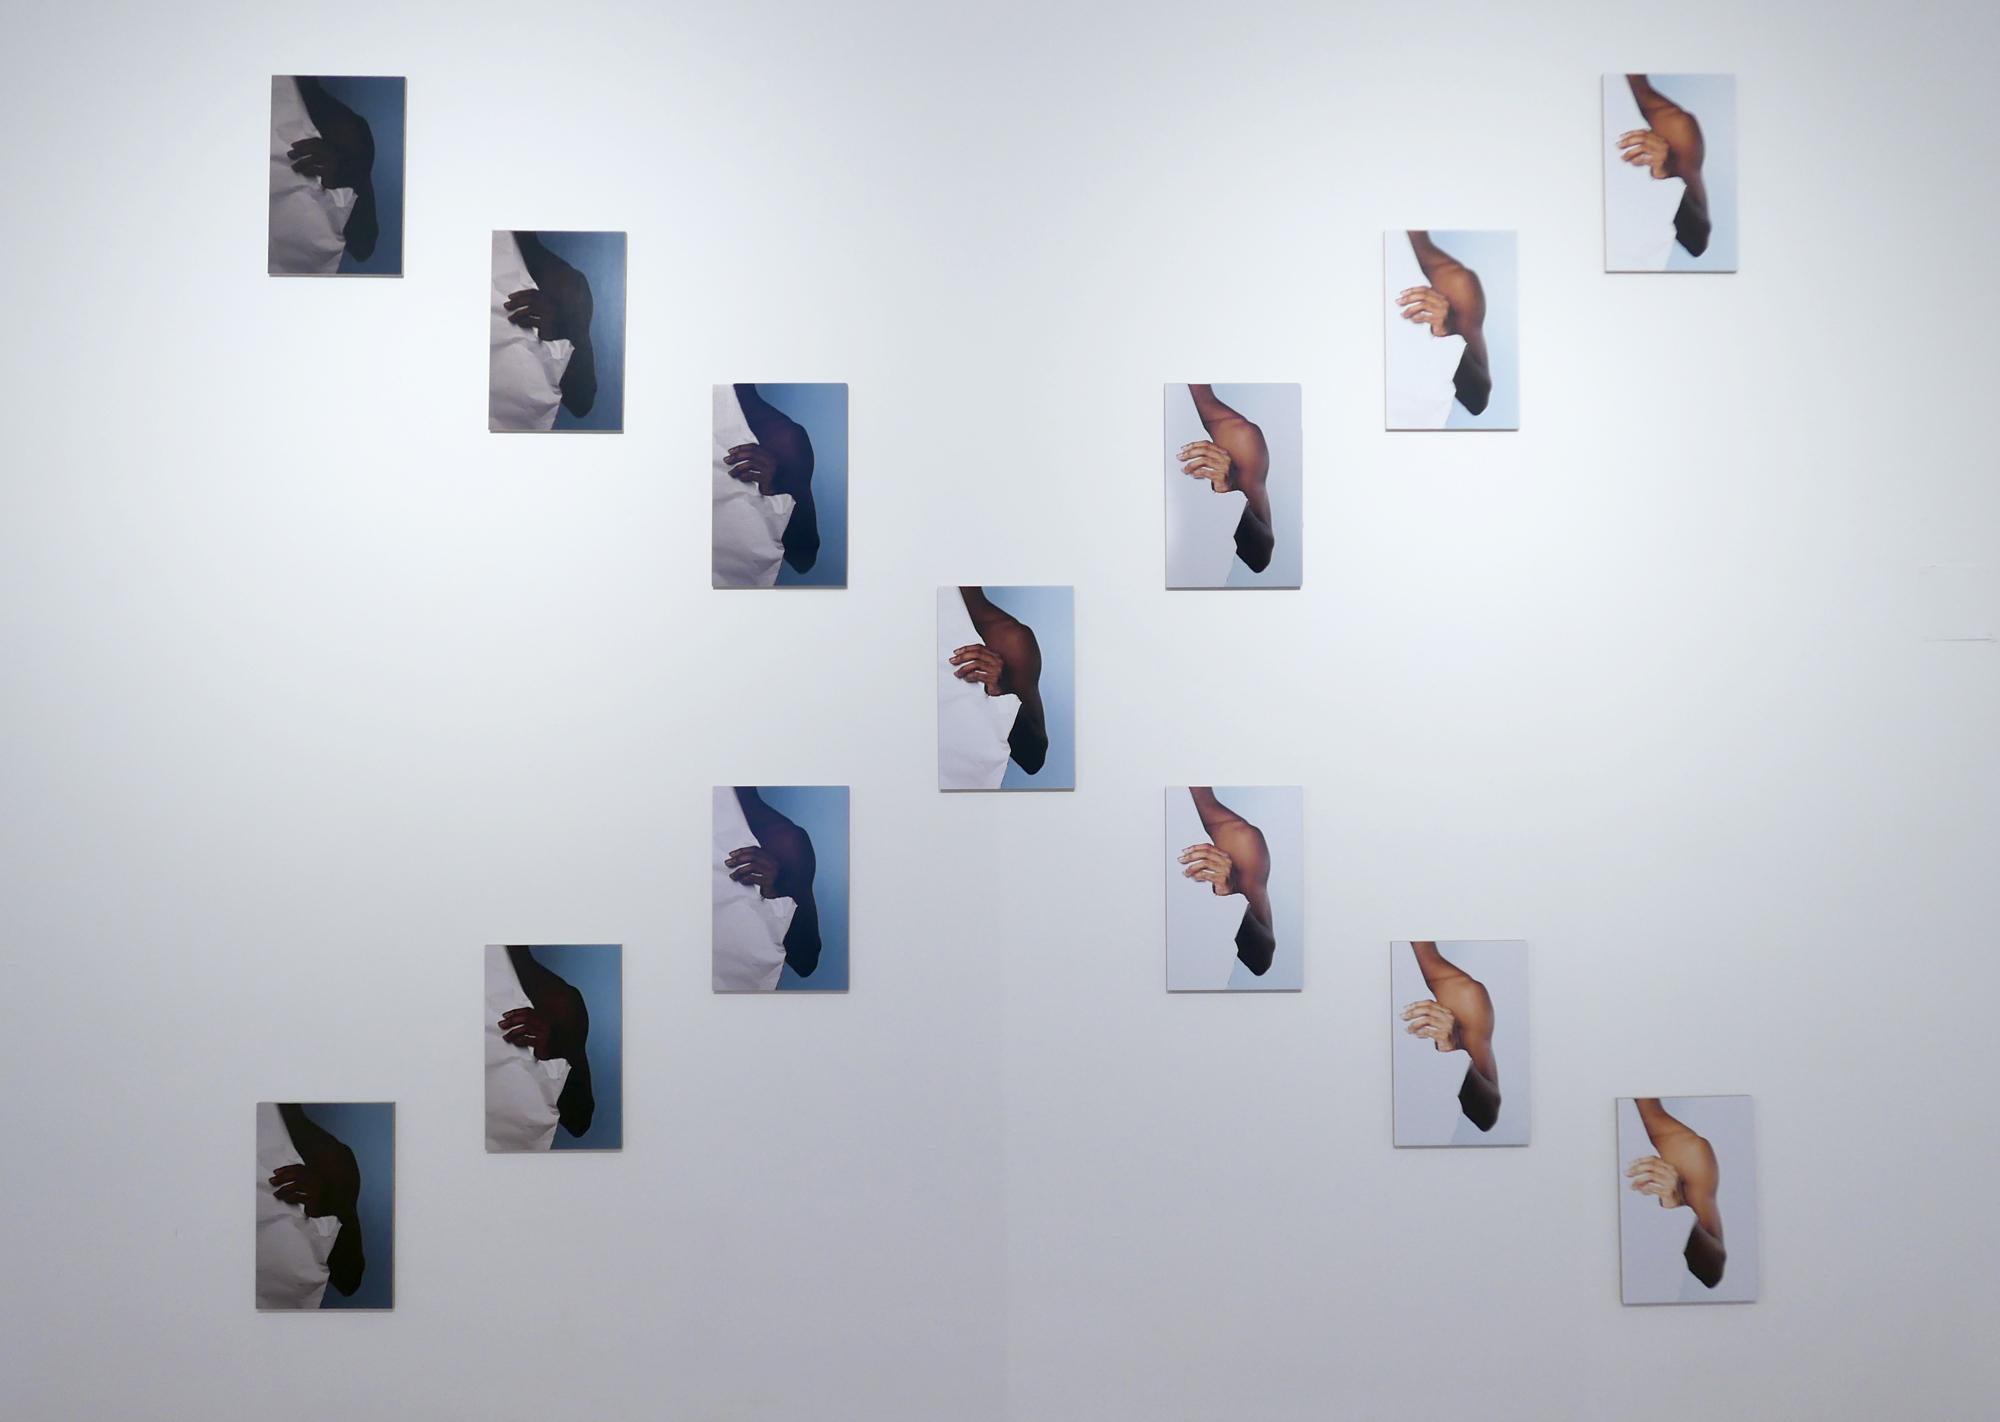 Radek Brousil: Ultimate Norm 2015, 13 pcs. digital C-prints mounted on MDF